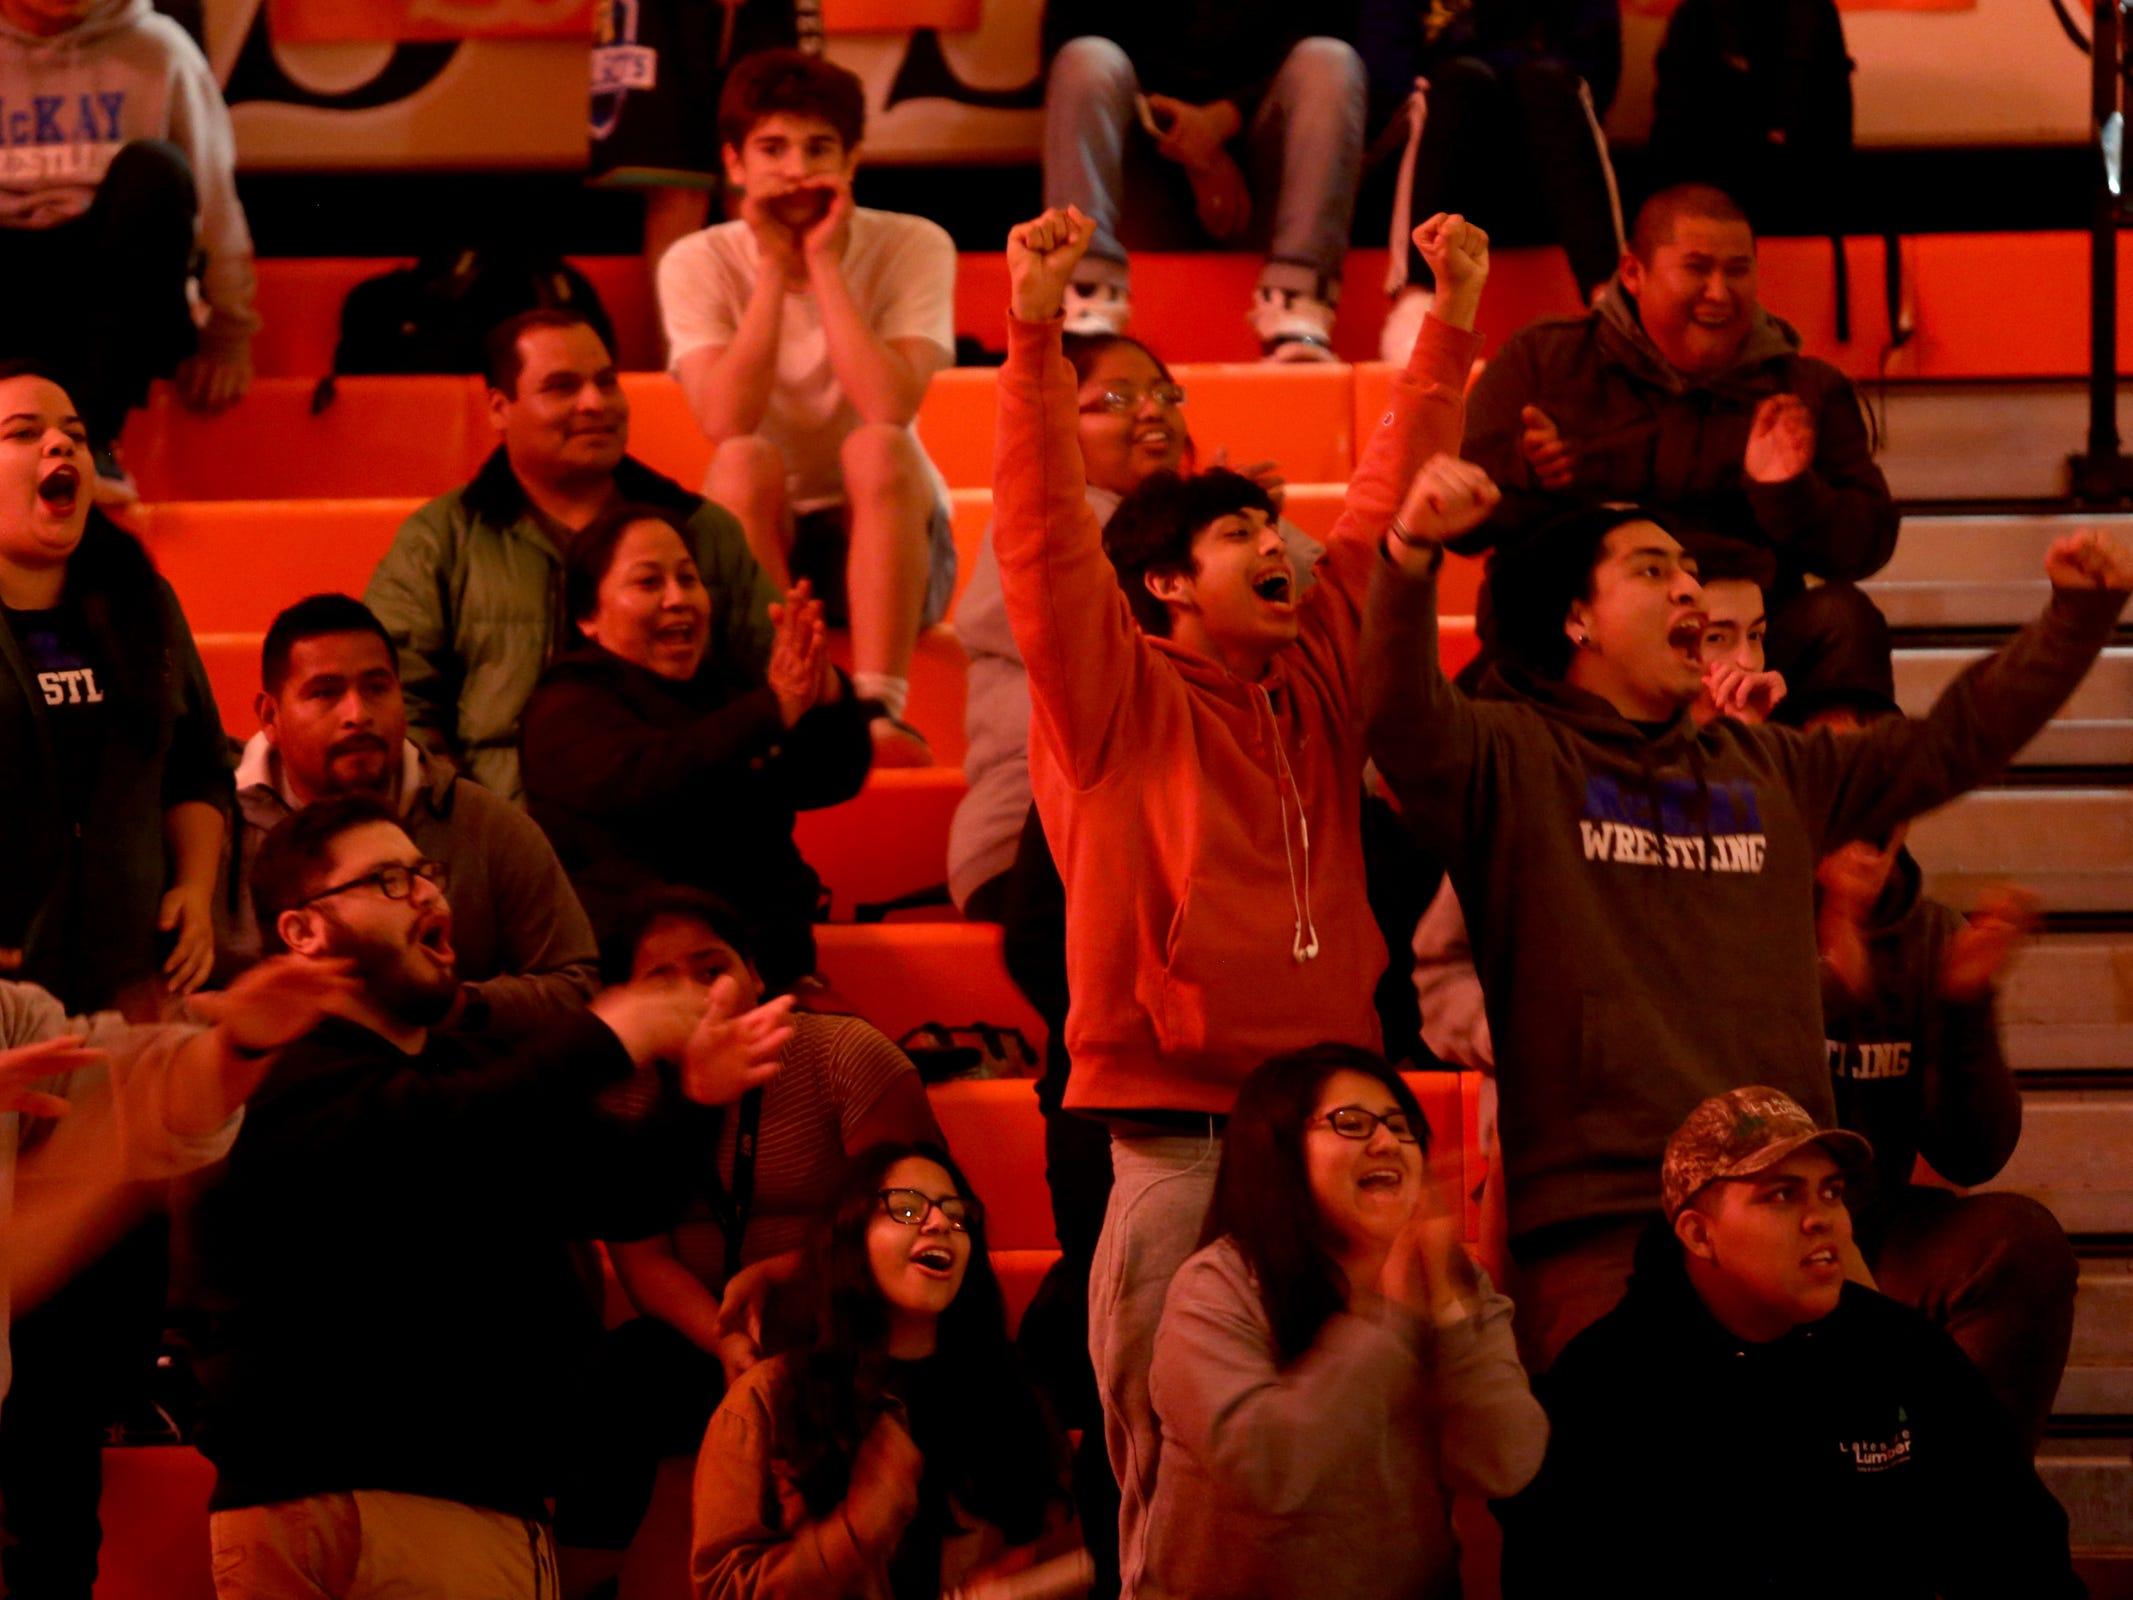 McKay fans cheer during the McKay vs. Sprague wrestling meet at Sprague High School in Salem on Wednesday, Jan. 9, 2019.